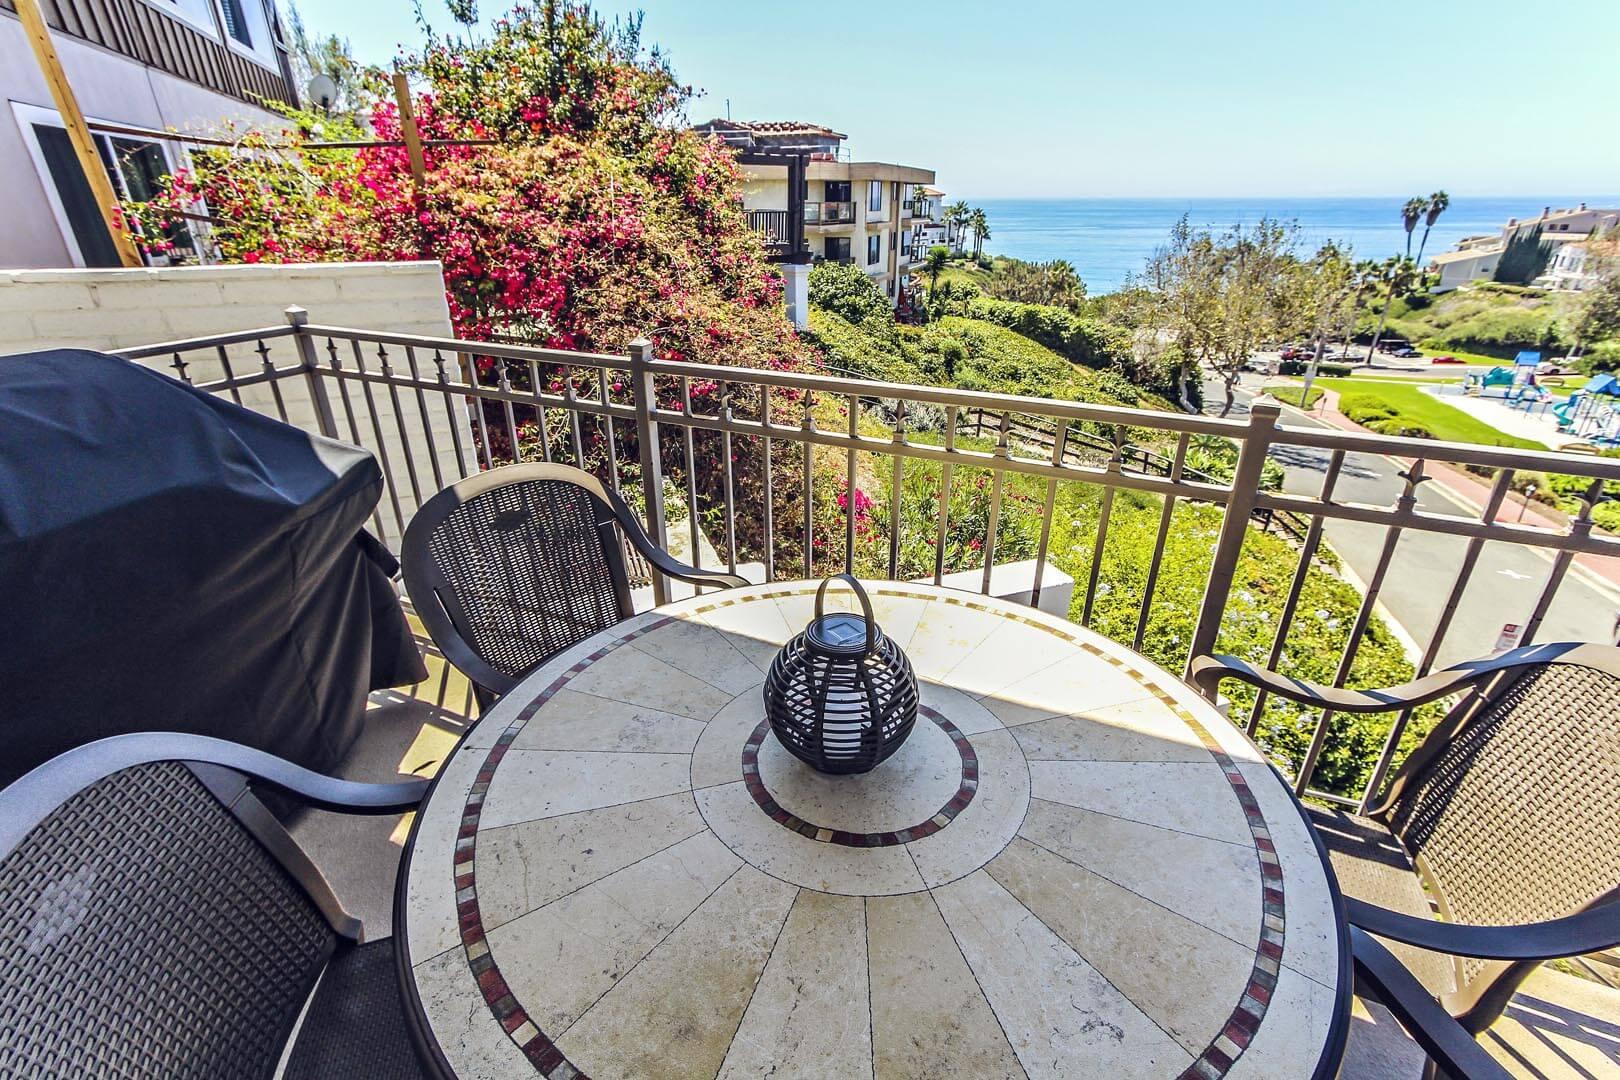 Four Seasons Pacifica Balcony View